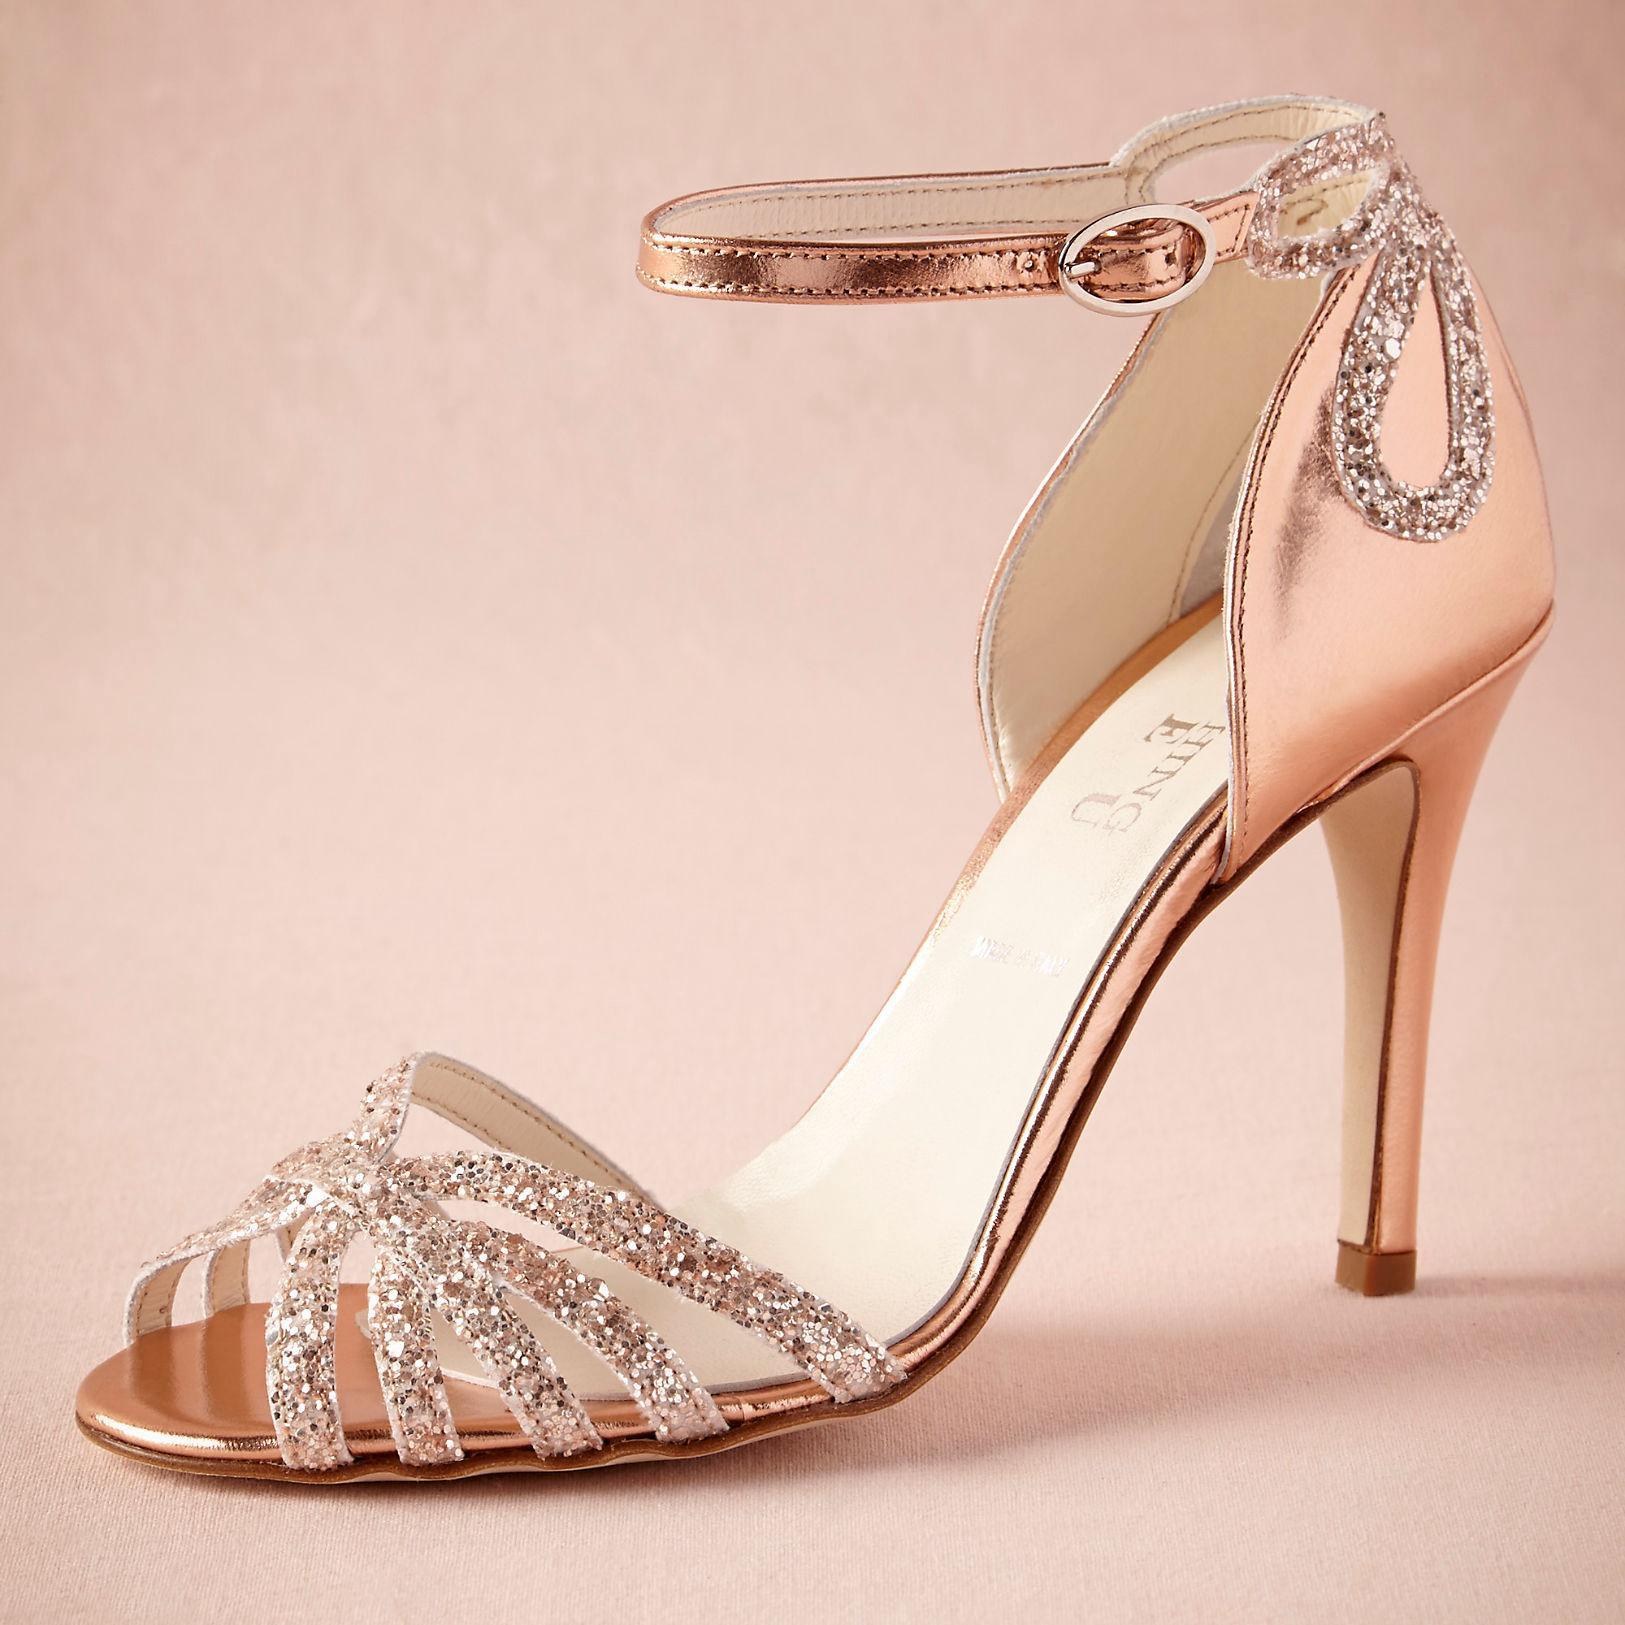 Rhinestone Wedding Shoes Low Heel 008 - Rhinestone Wedding Shoes Low Heel